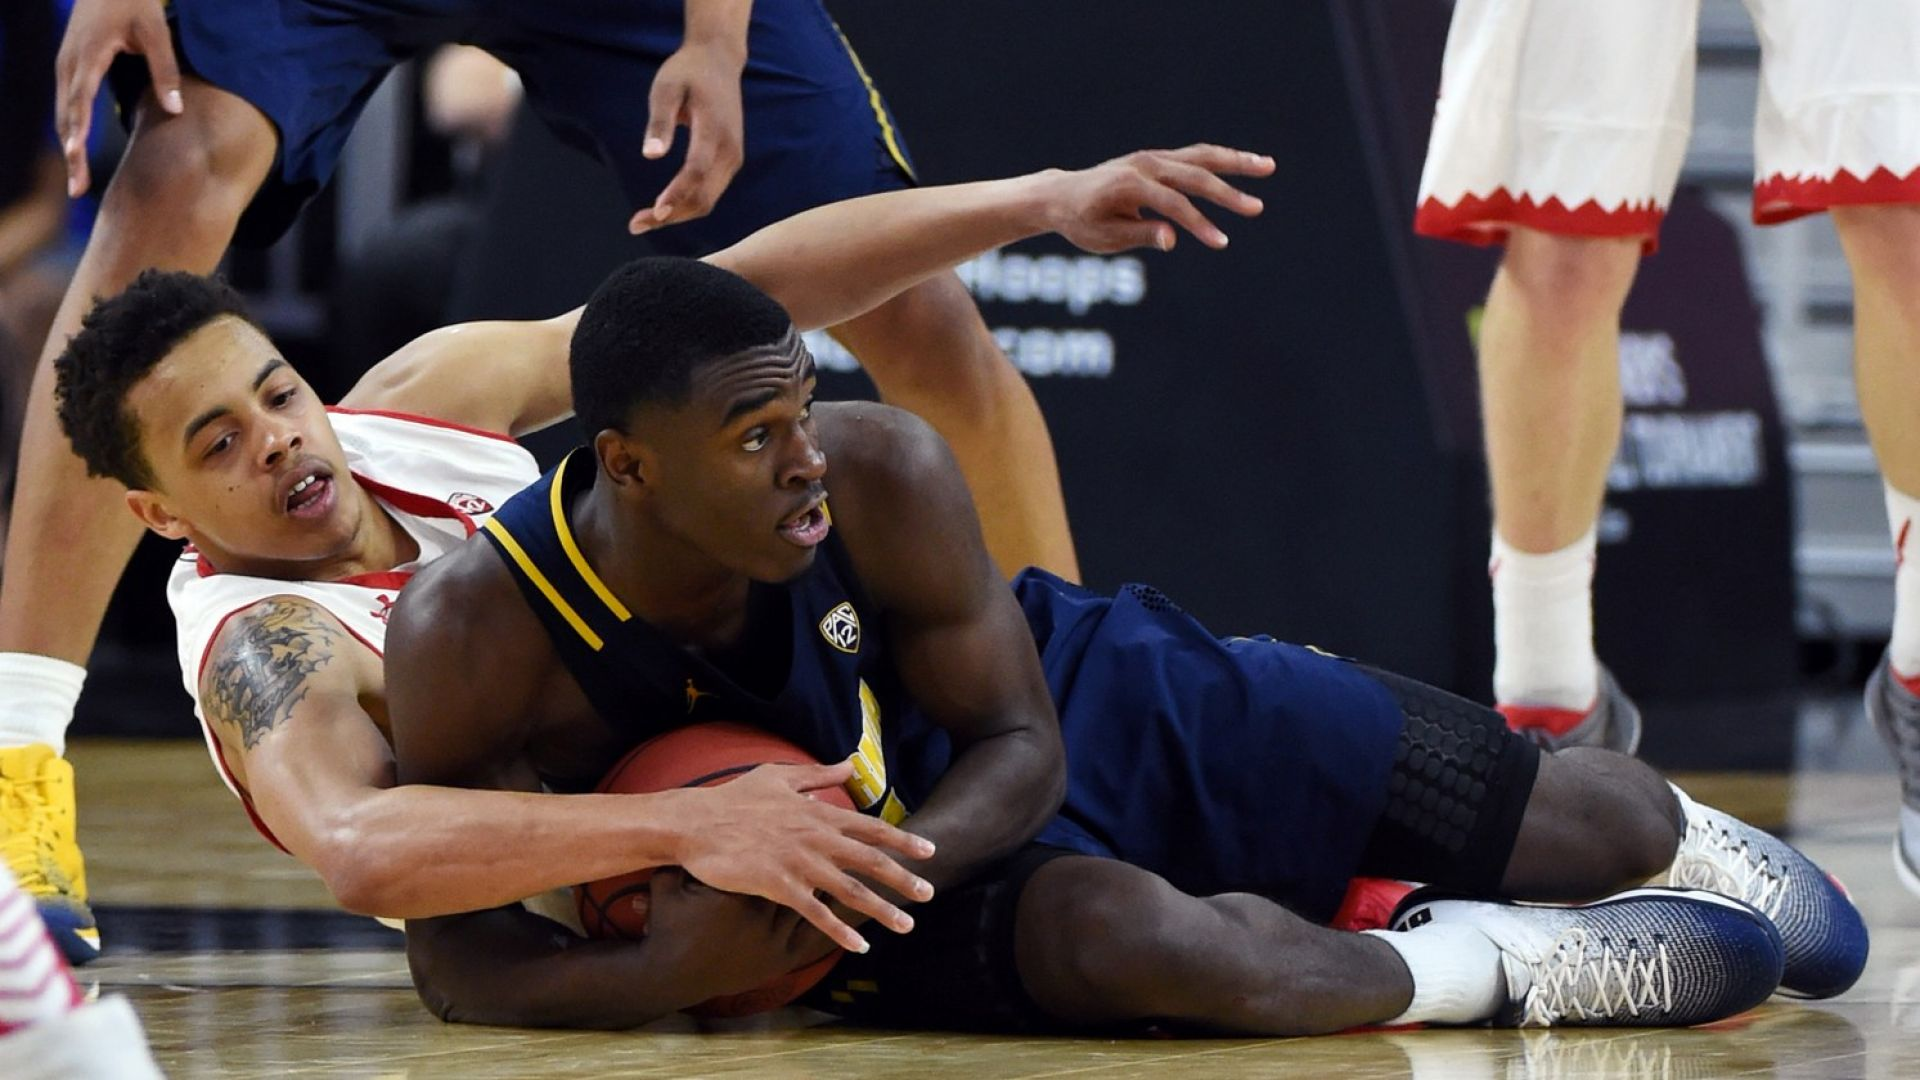 Играч от НБА бе арестуван заради домашно насилие